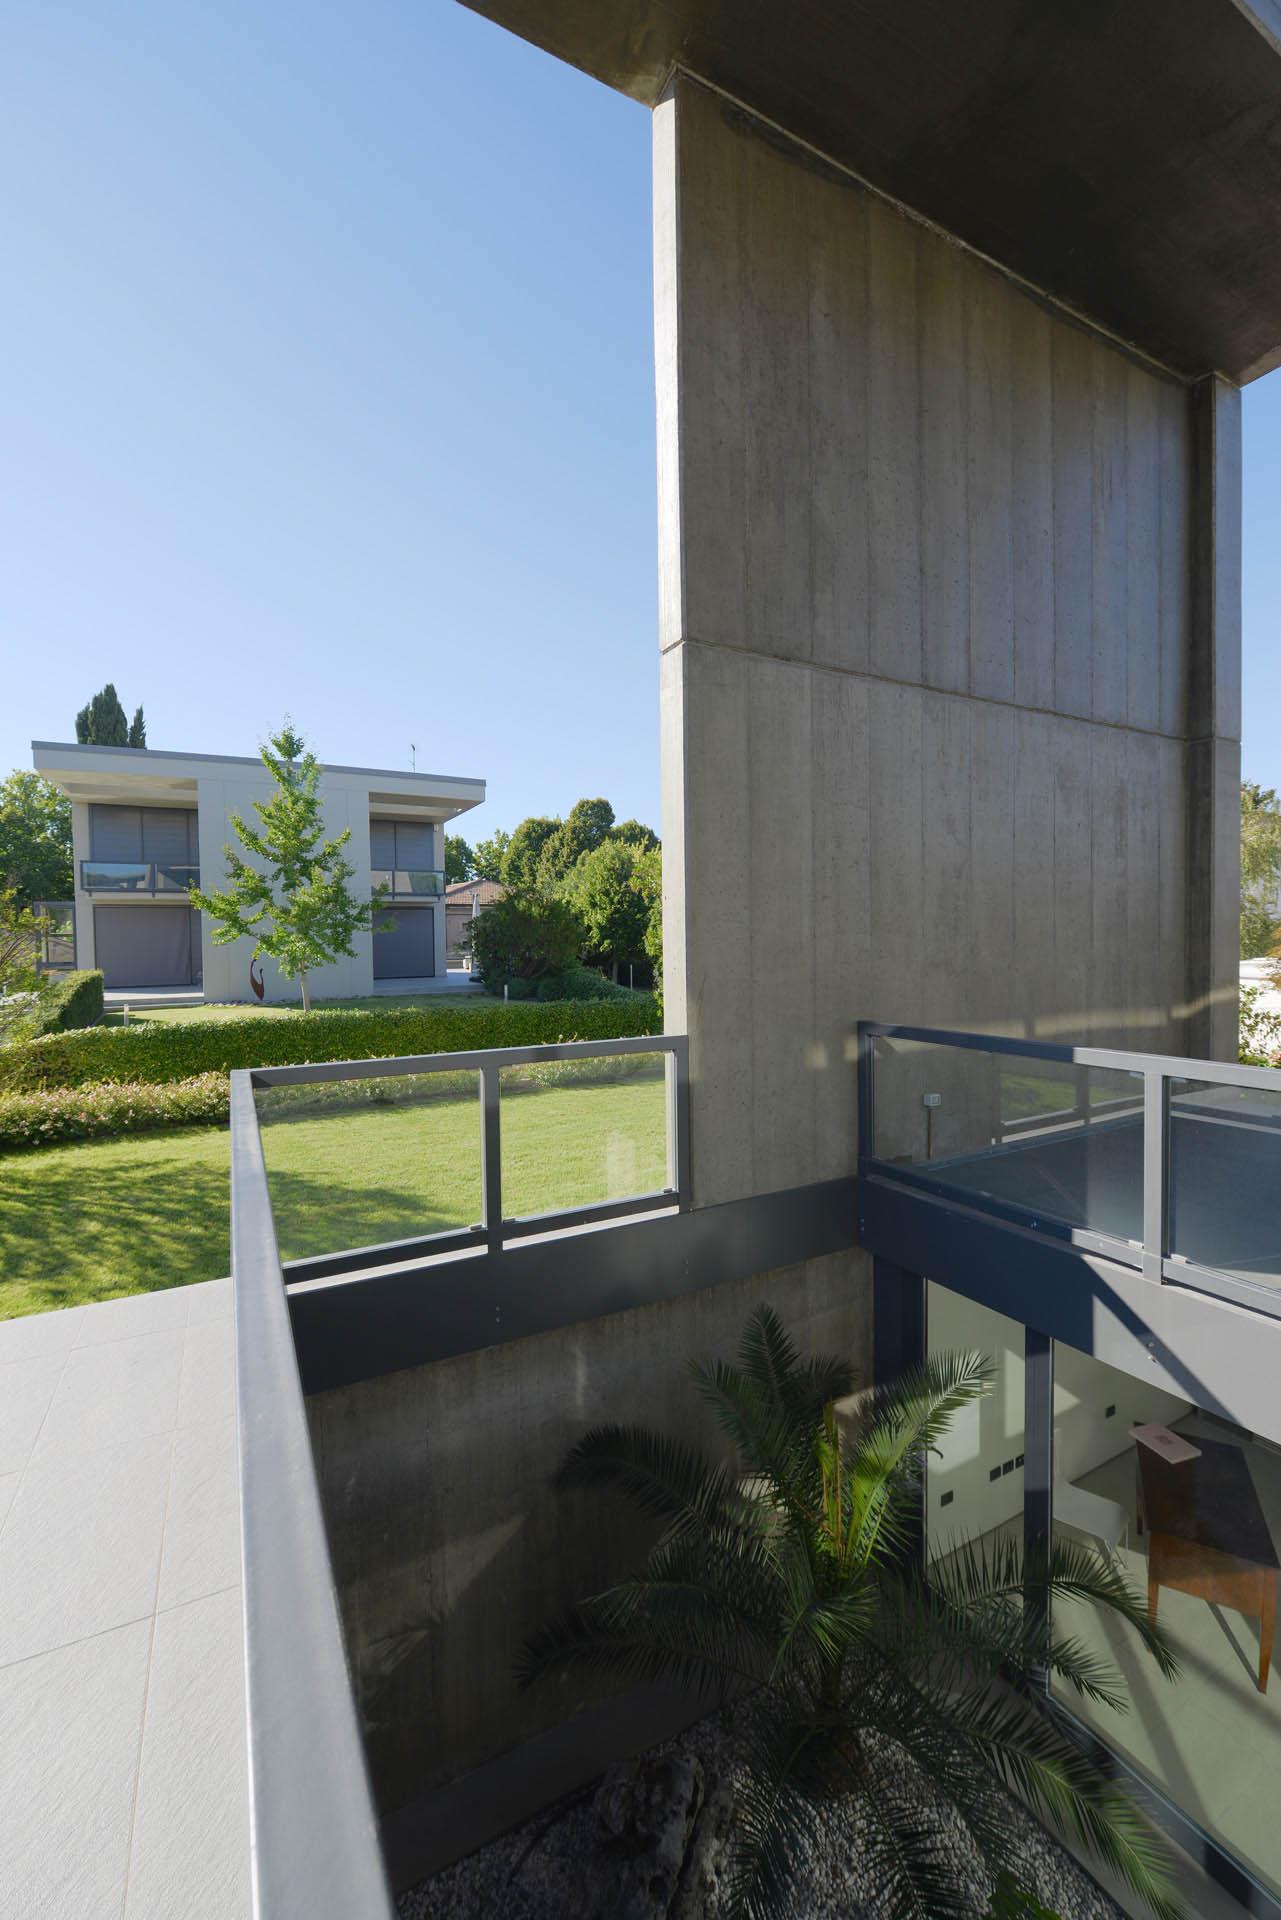 05 Studio Bacchi architetti associati casa 3 img 05